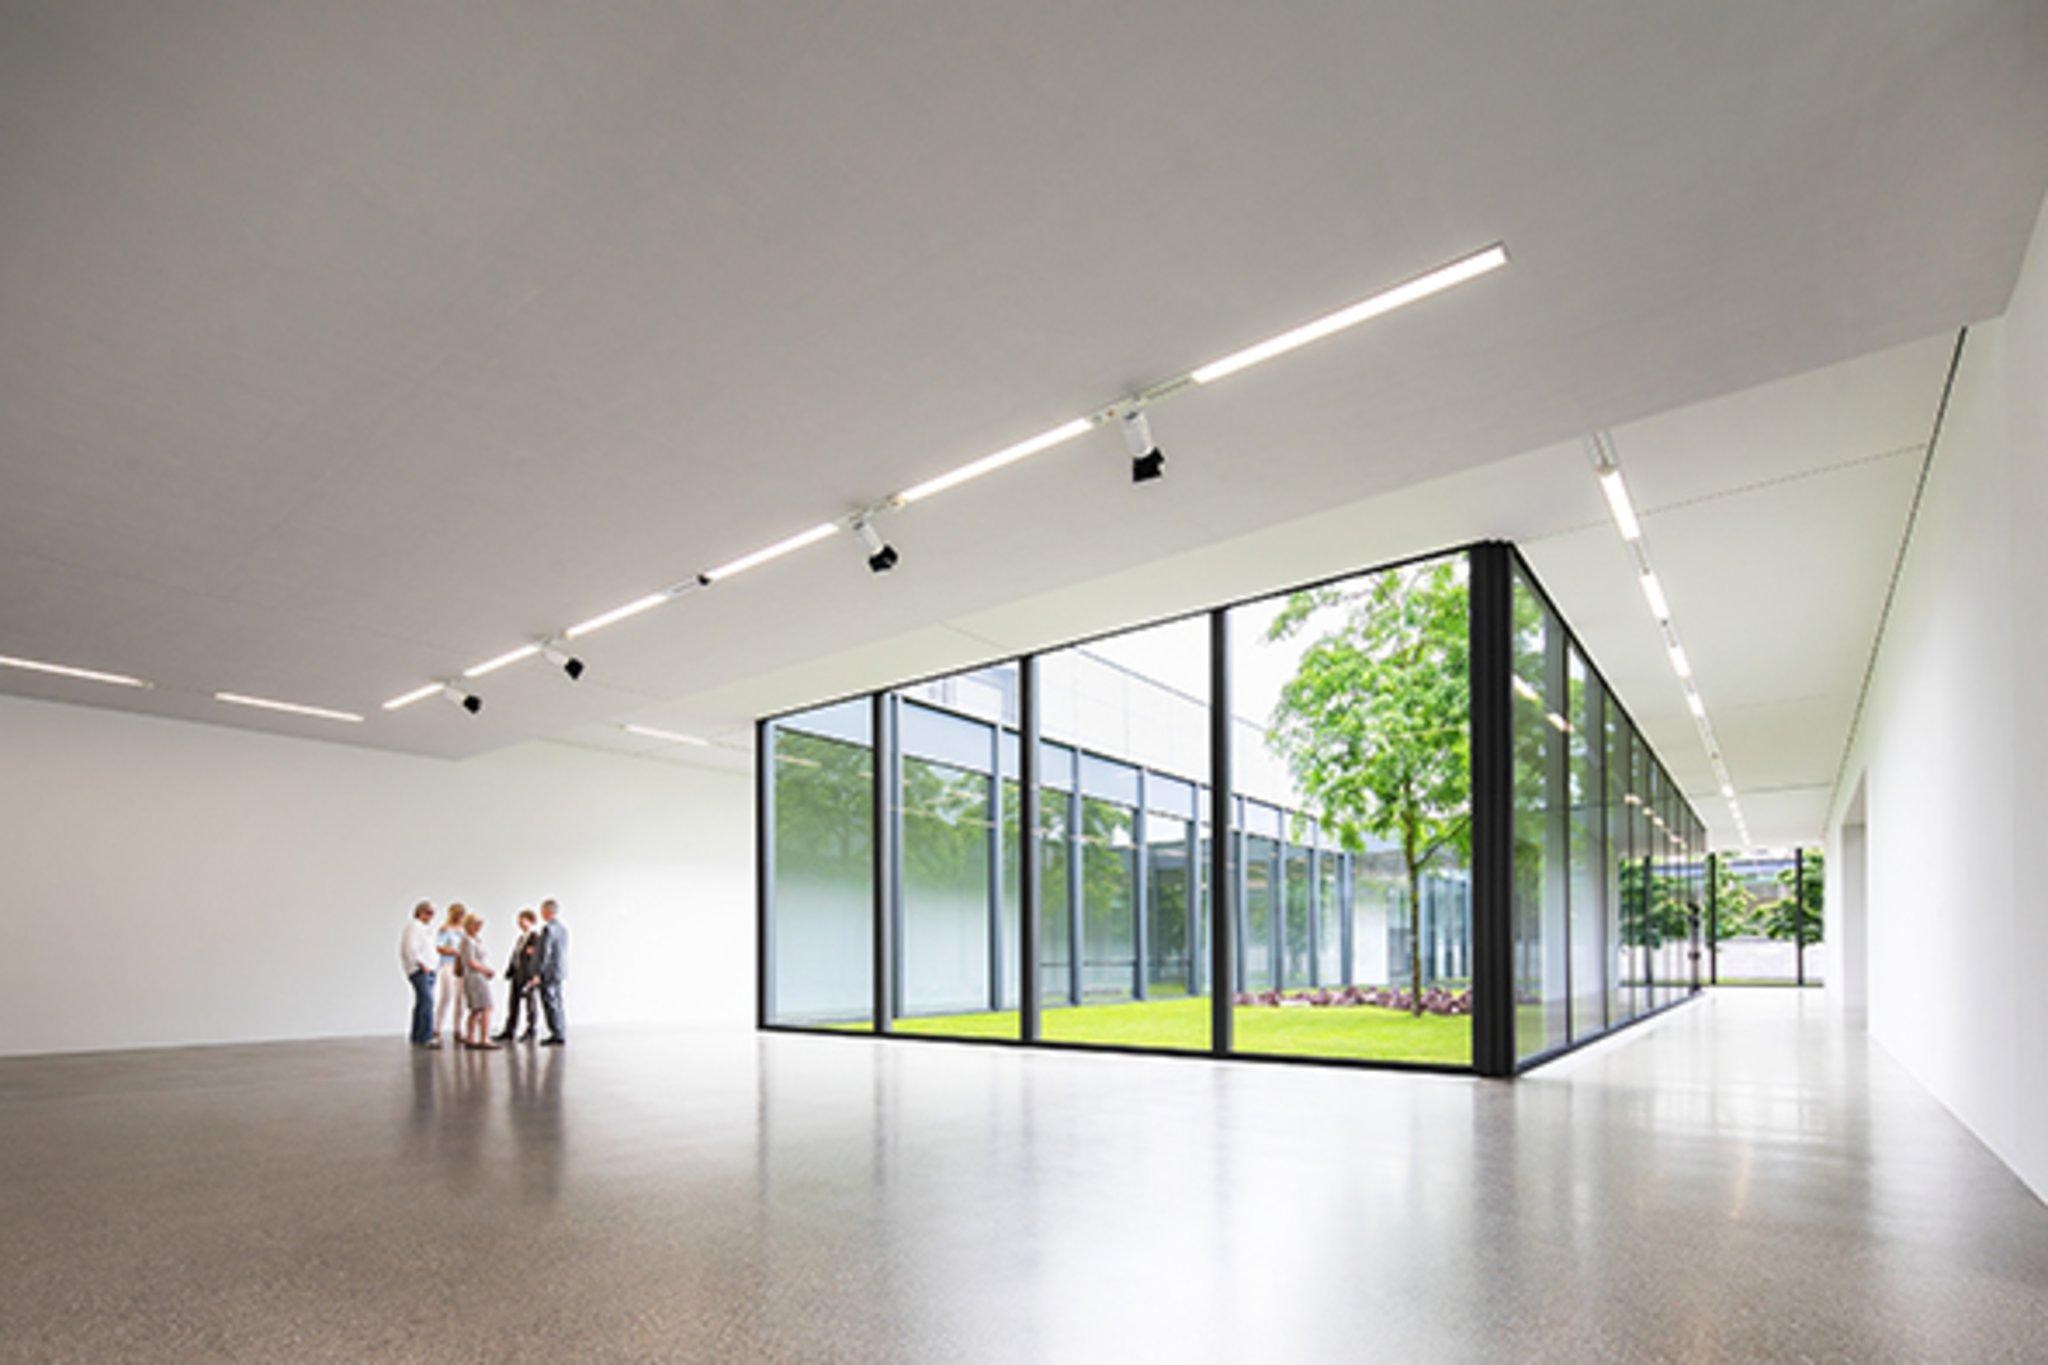 Los geht es im Januar mit Lyonel Feininger: Museum Folkwang präsentiert 2019 seine Sammlung neu